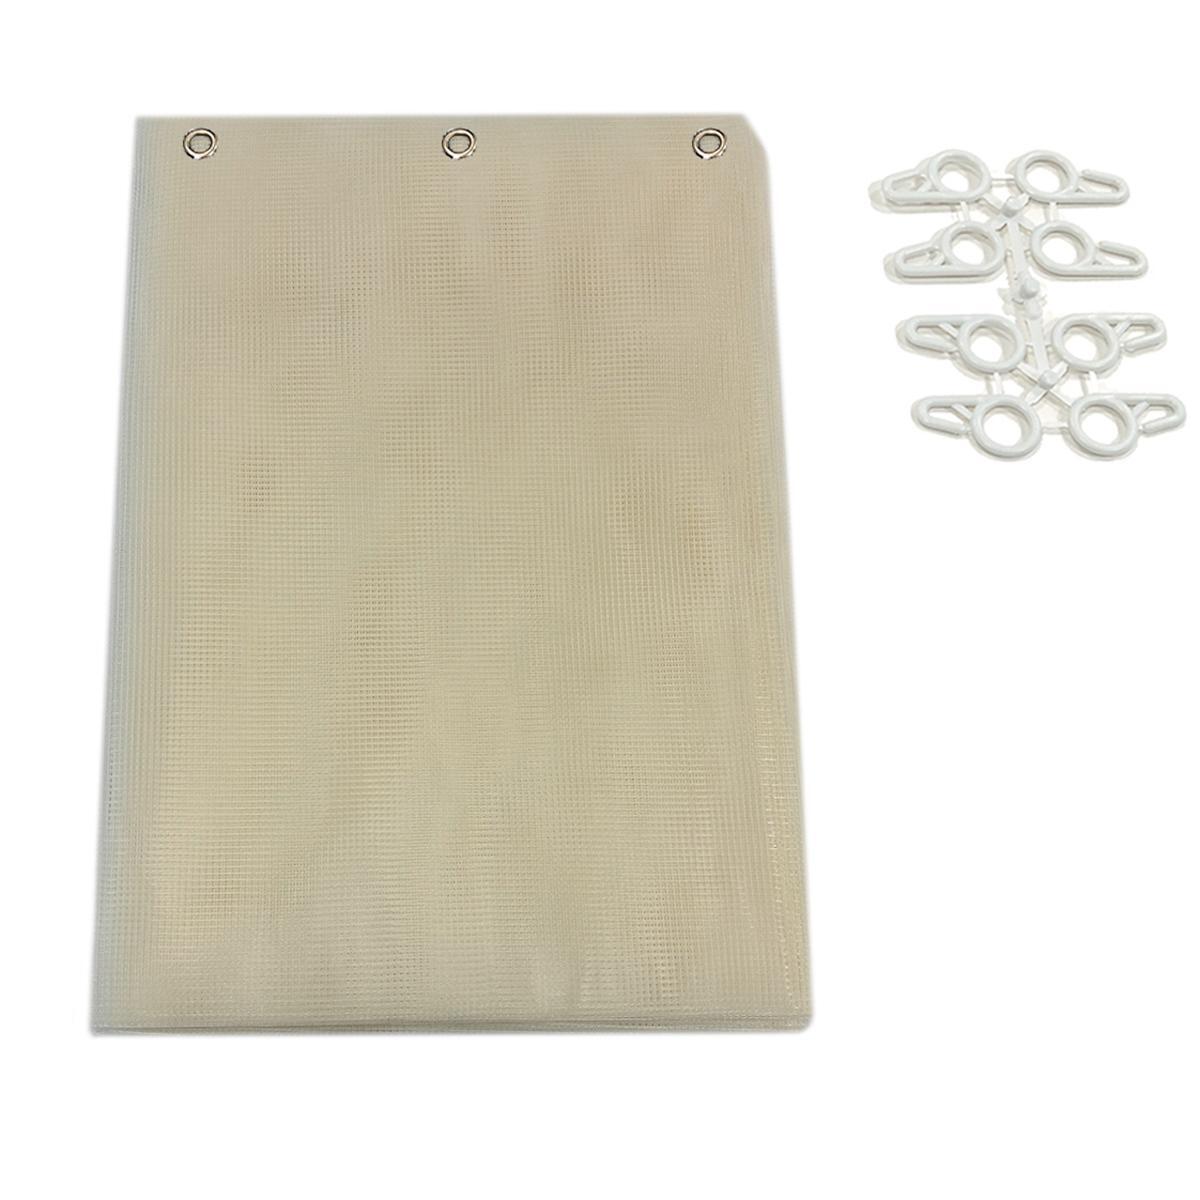 Tenda zanzariera ad anelli L 150 x H 250 cm beige - 3